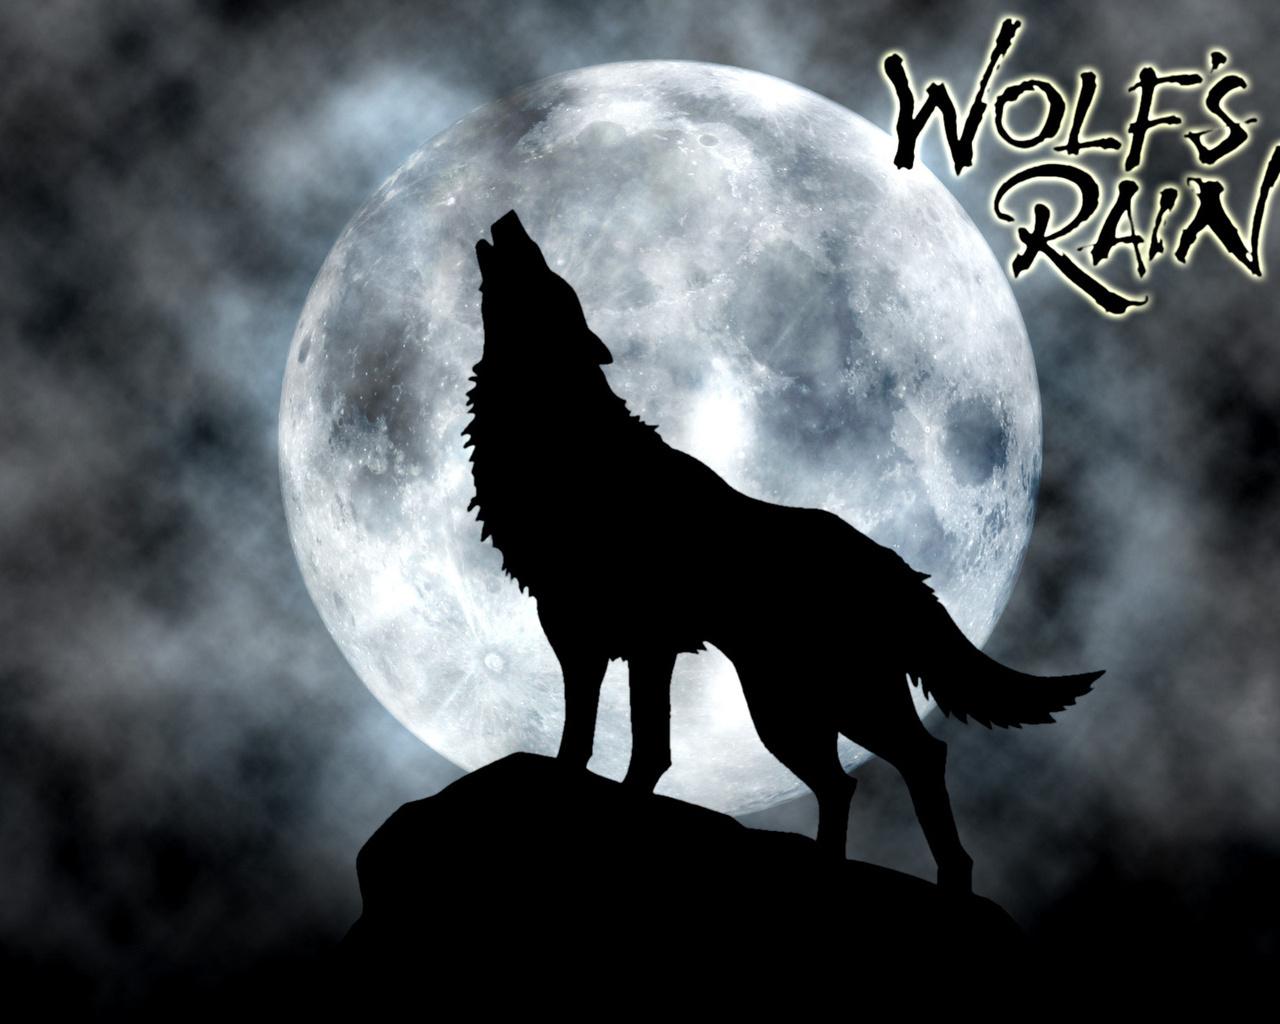 papeis de parede wolf s rain lobo lua silhueta anime baixar imagens